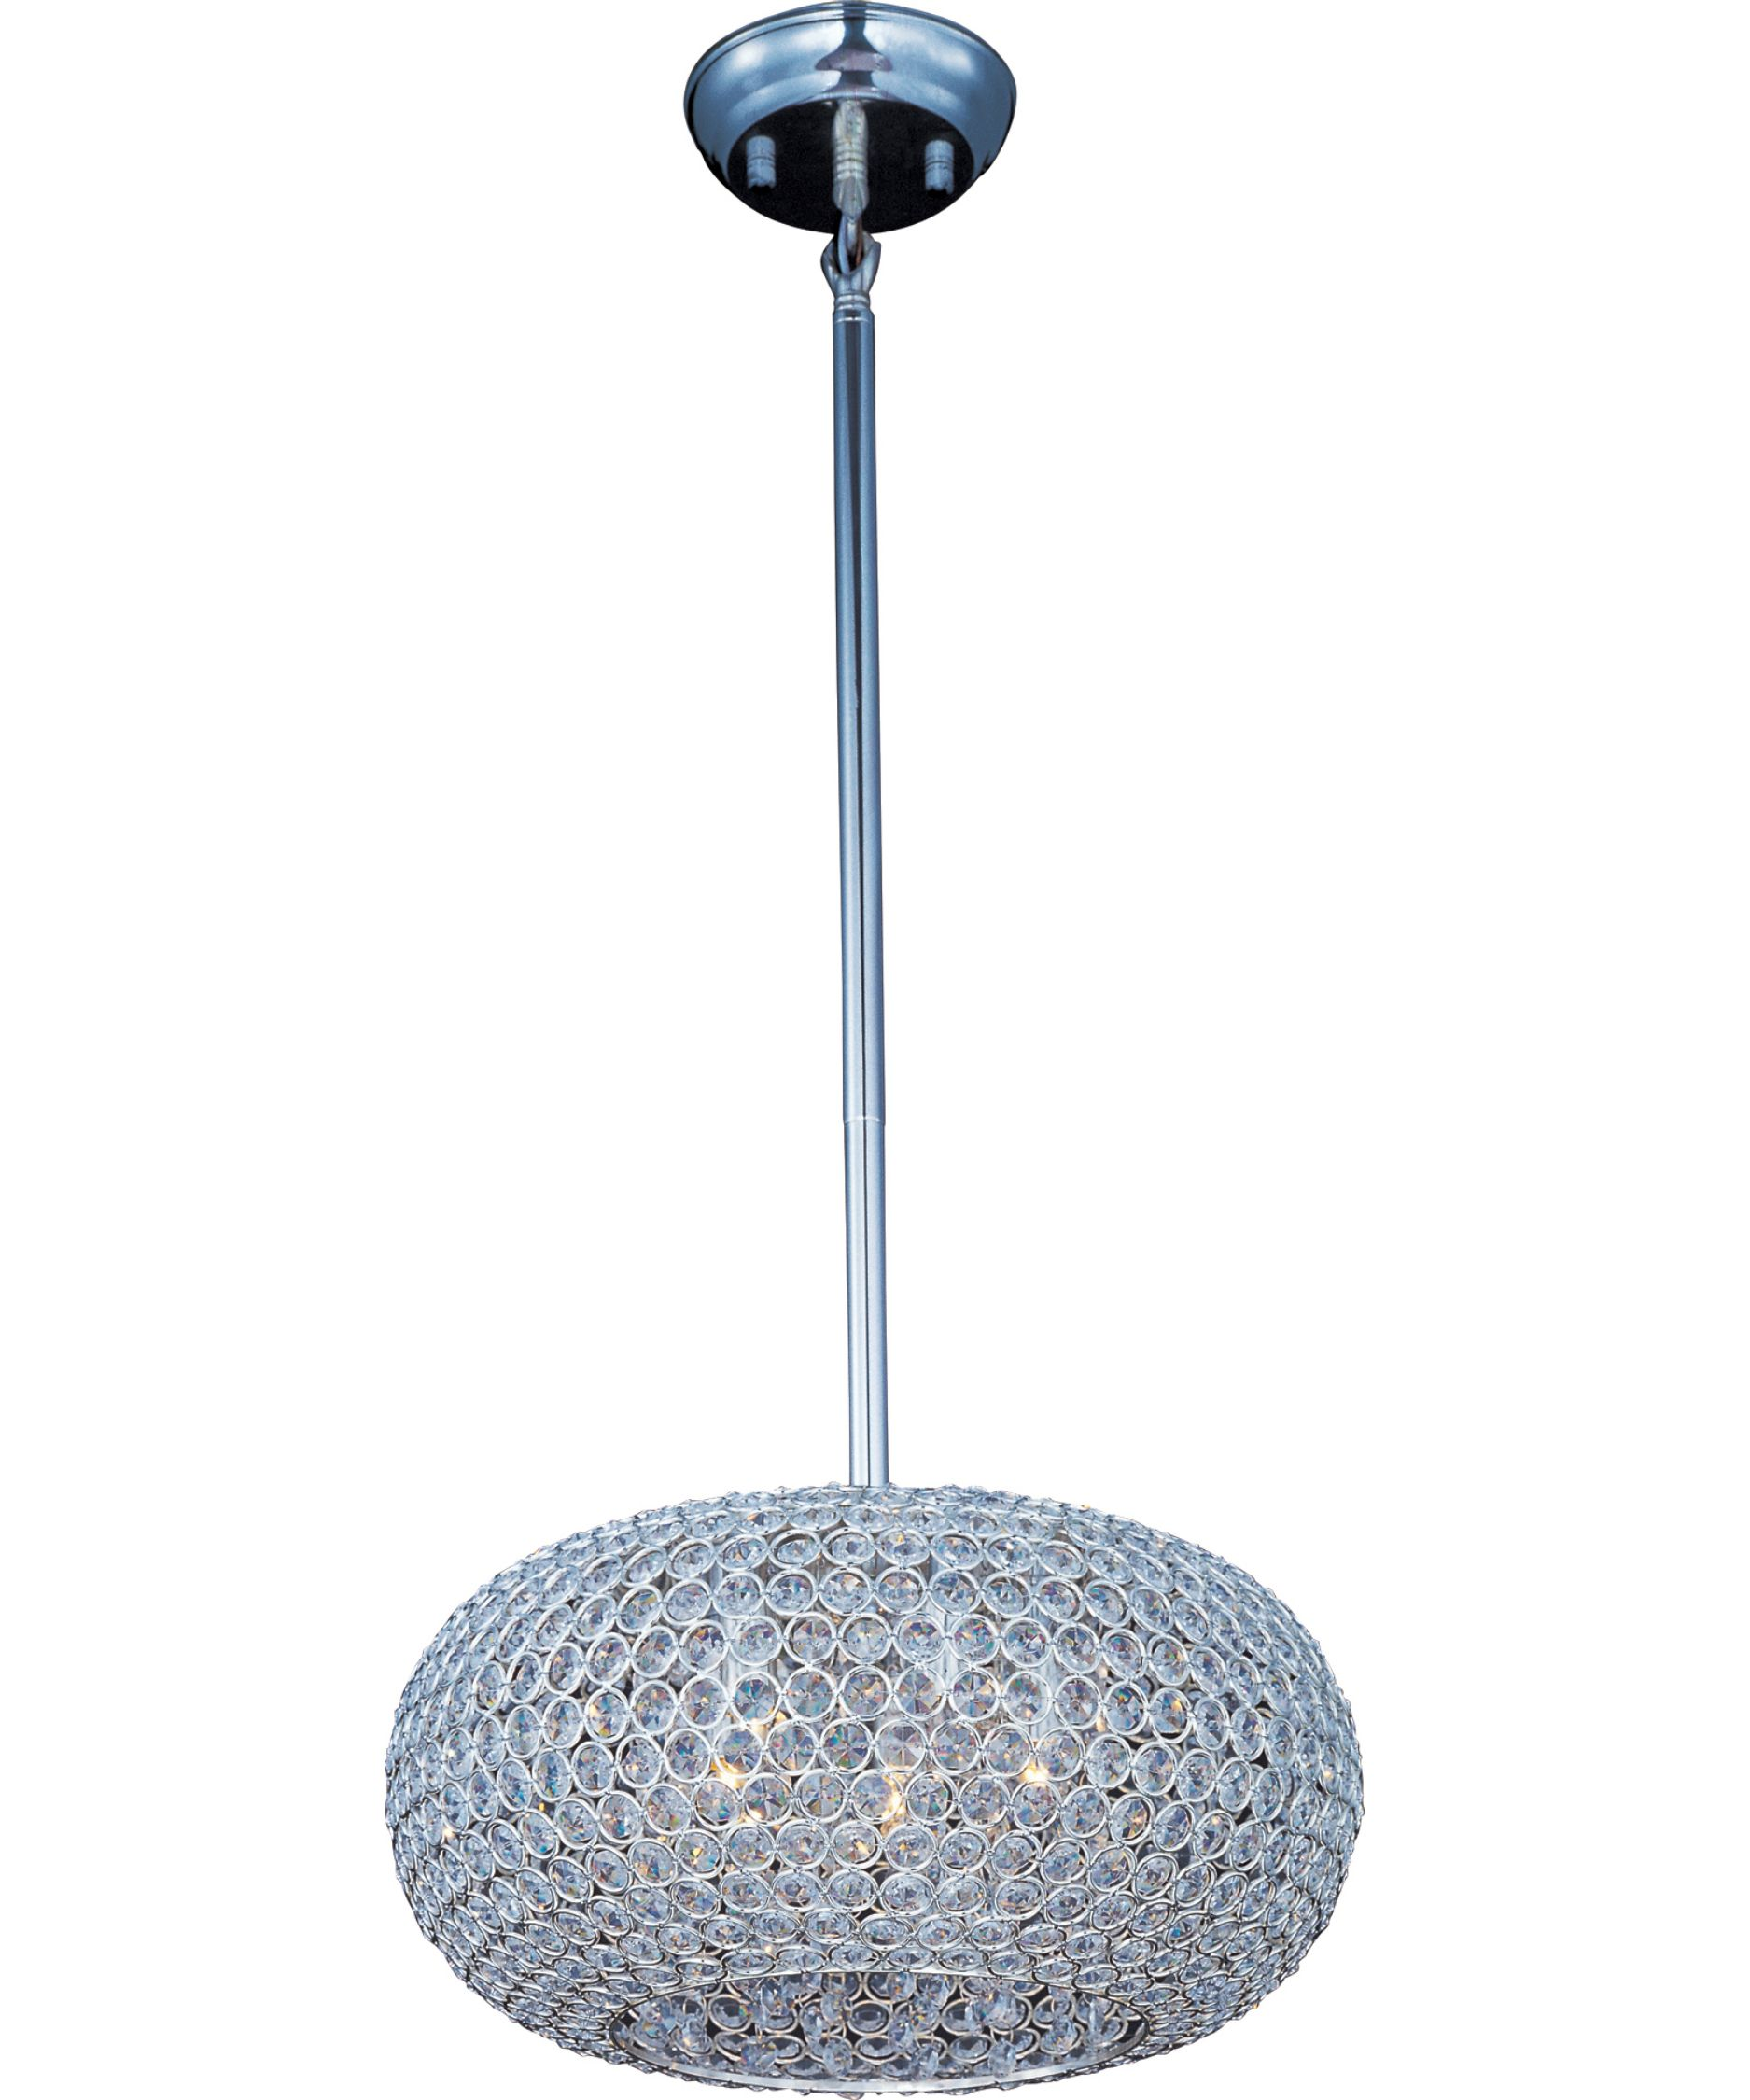 Glimmer 15 Inch Mini Pendant by Maxim Lighting Maxim